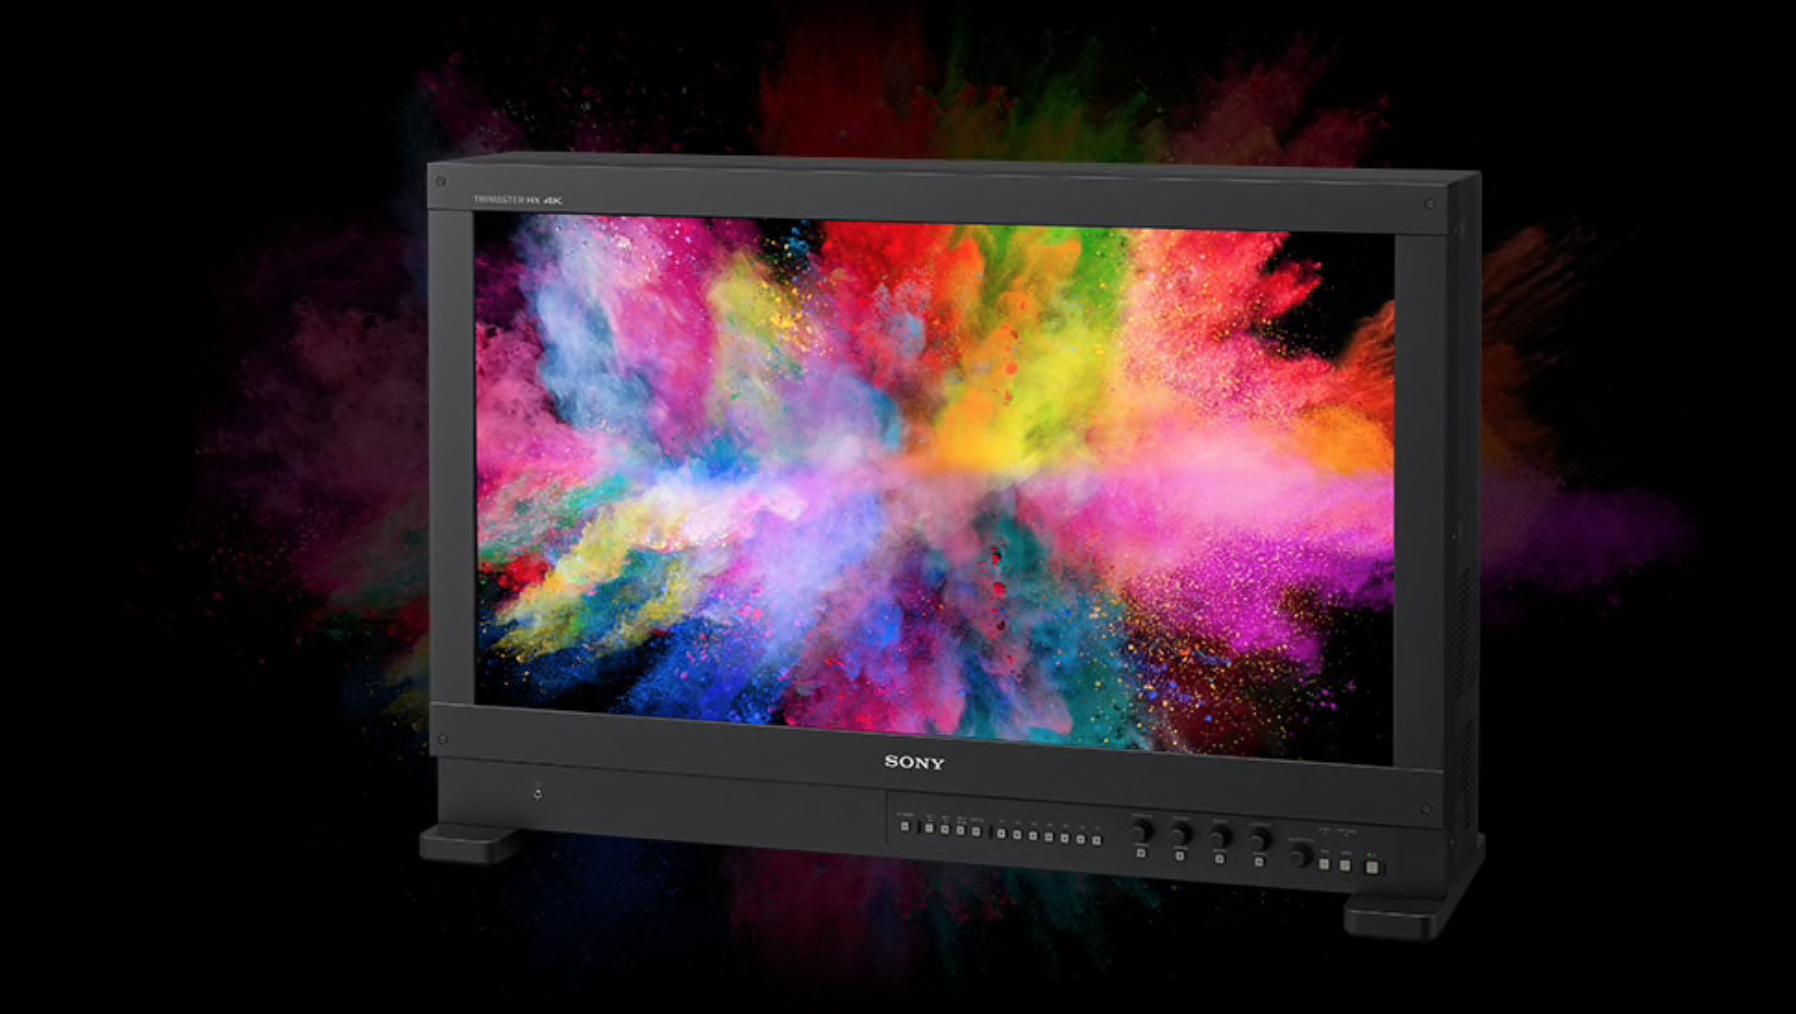 Sony BVM-HX310